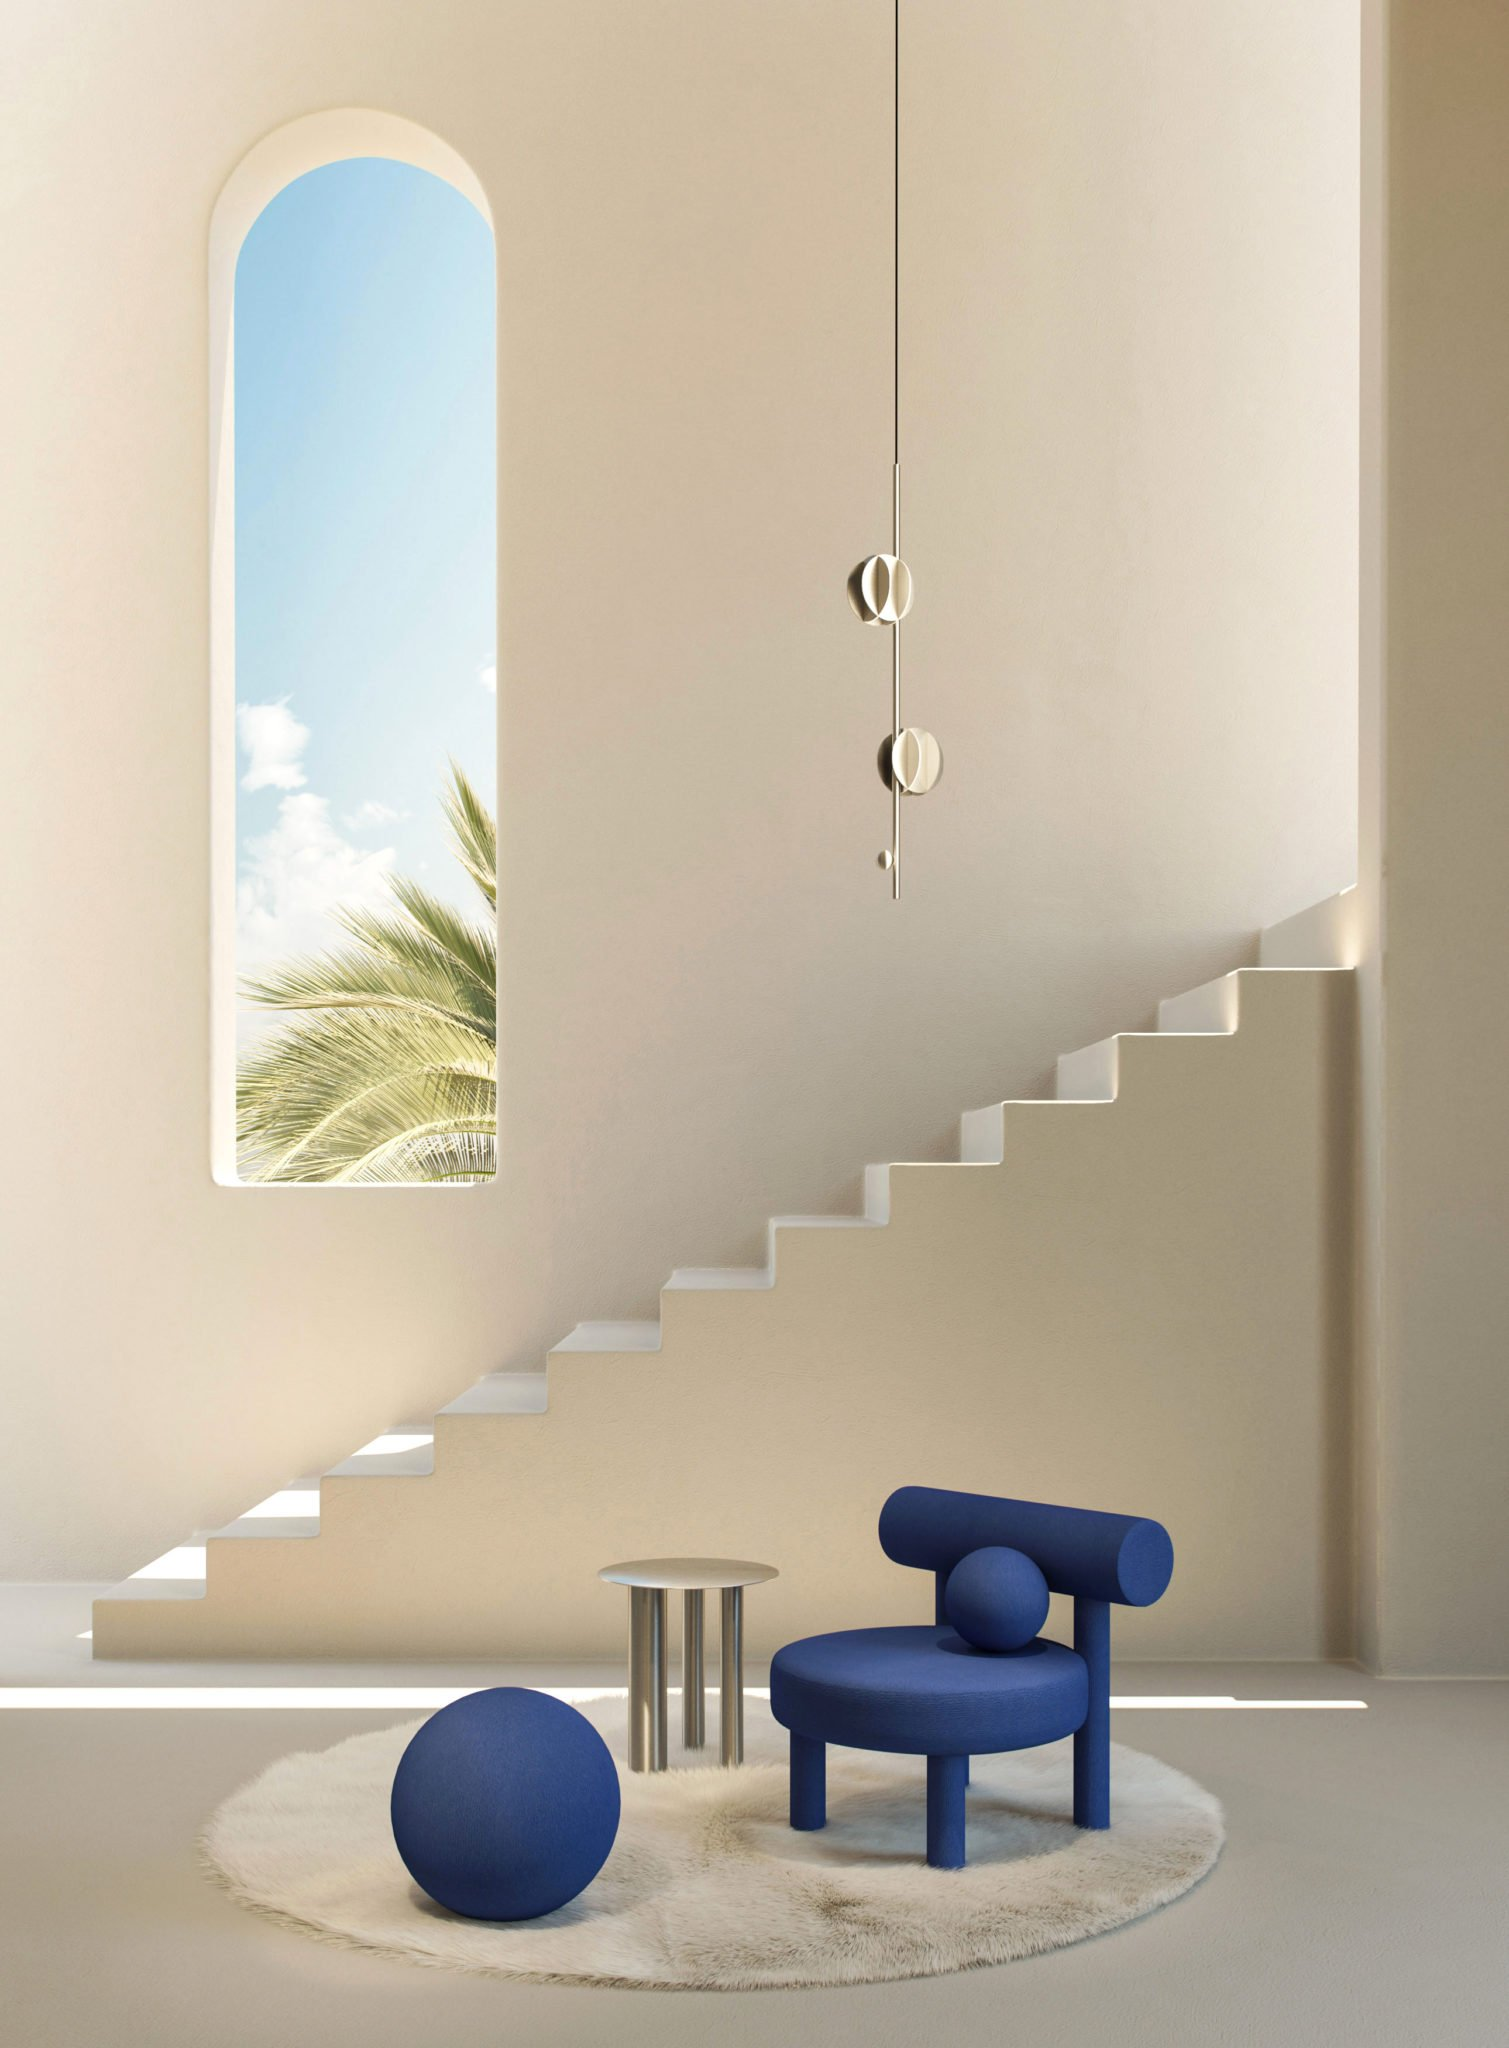 Maison et Objet 2020, NOOM, Gropius furniture collection